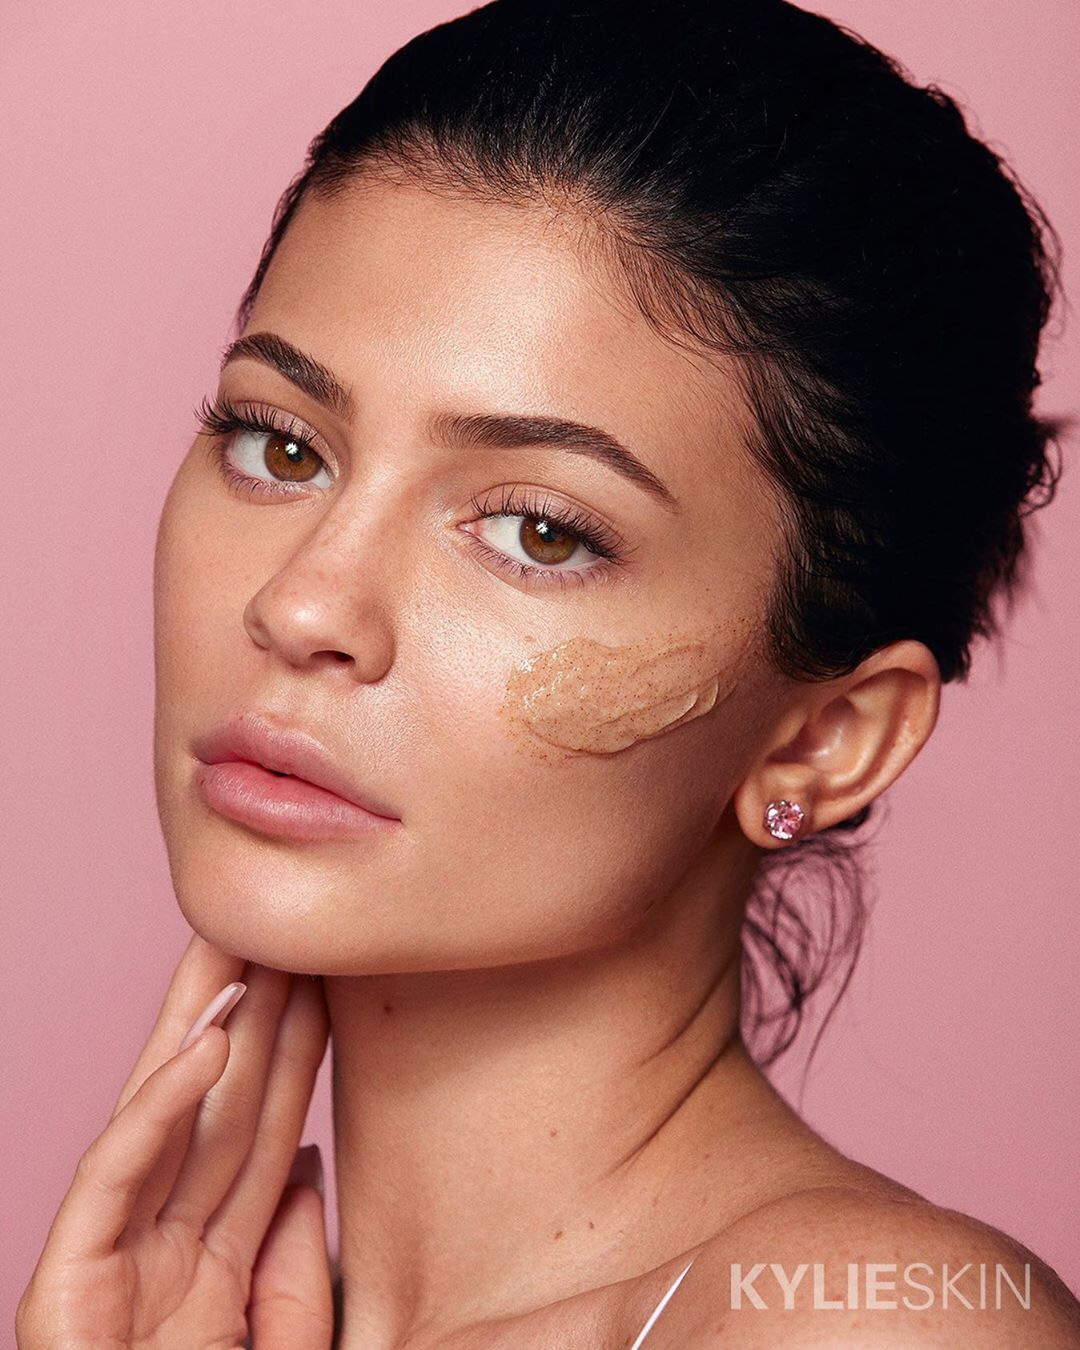 Kylie Jenner x Kylie Skin